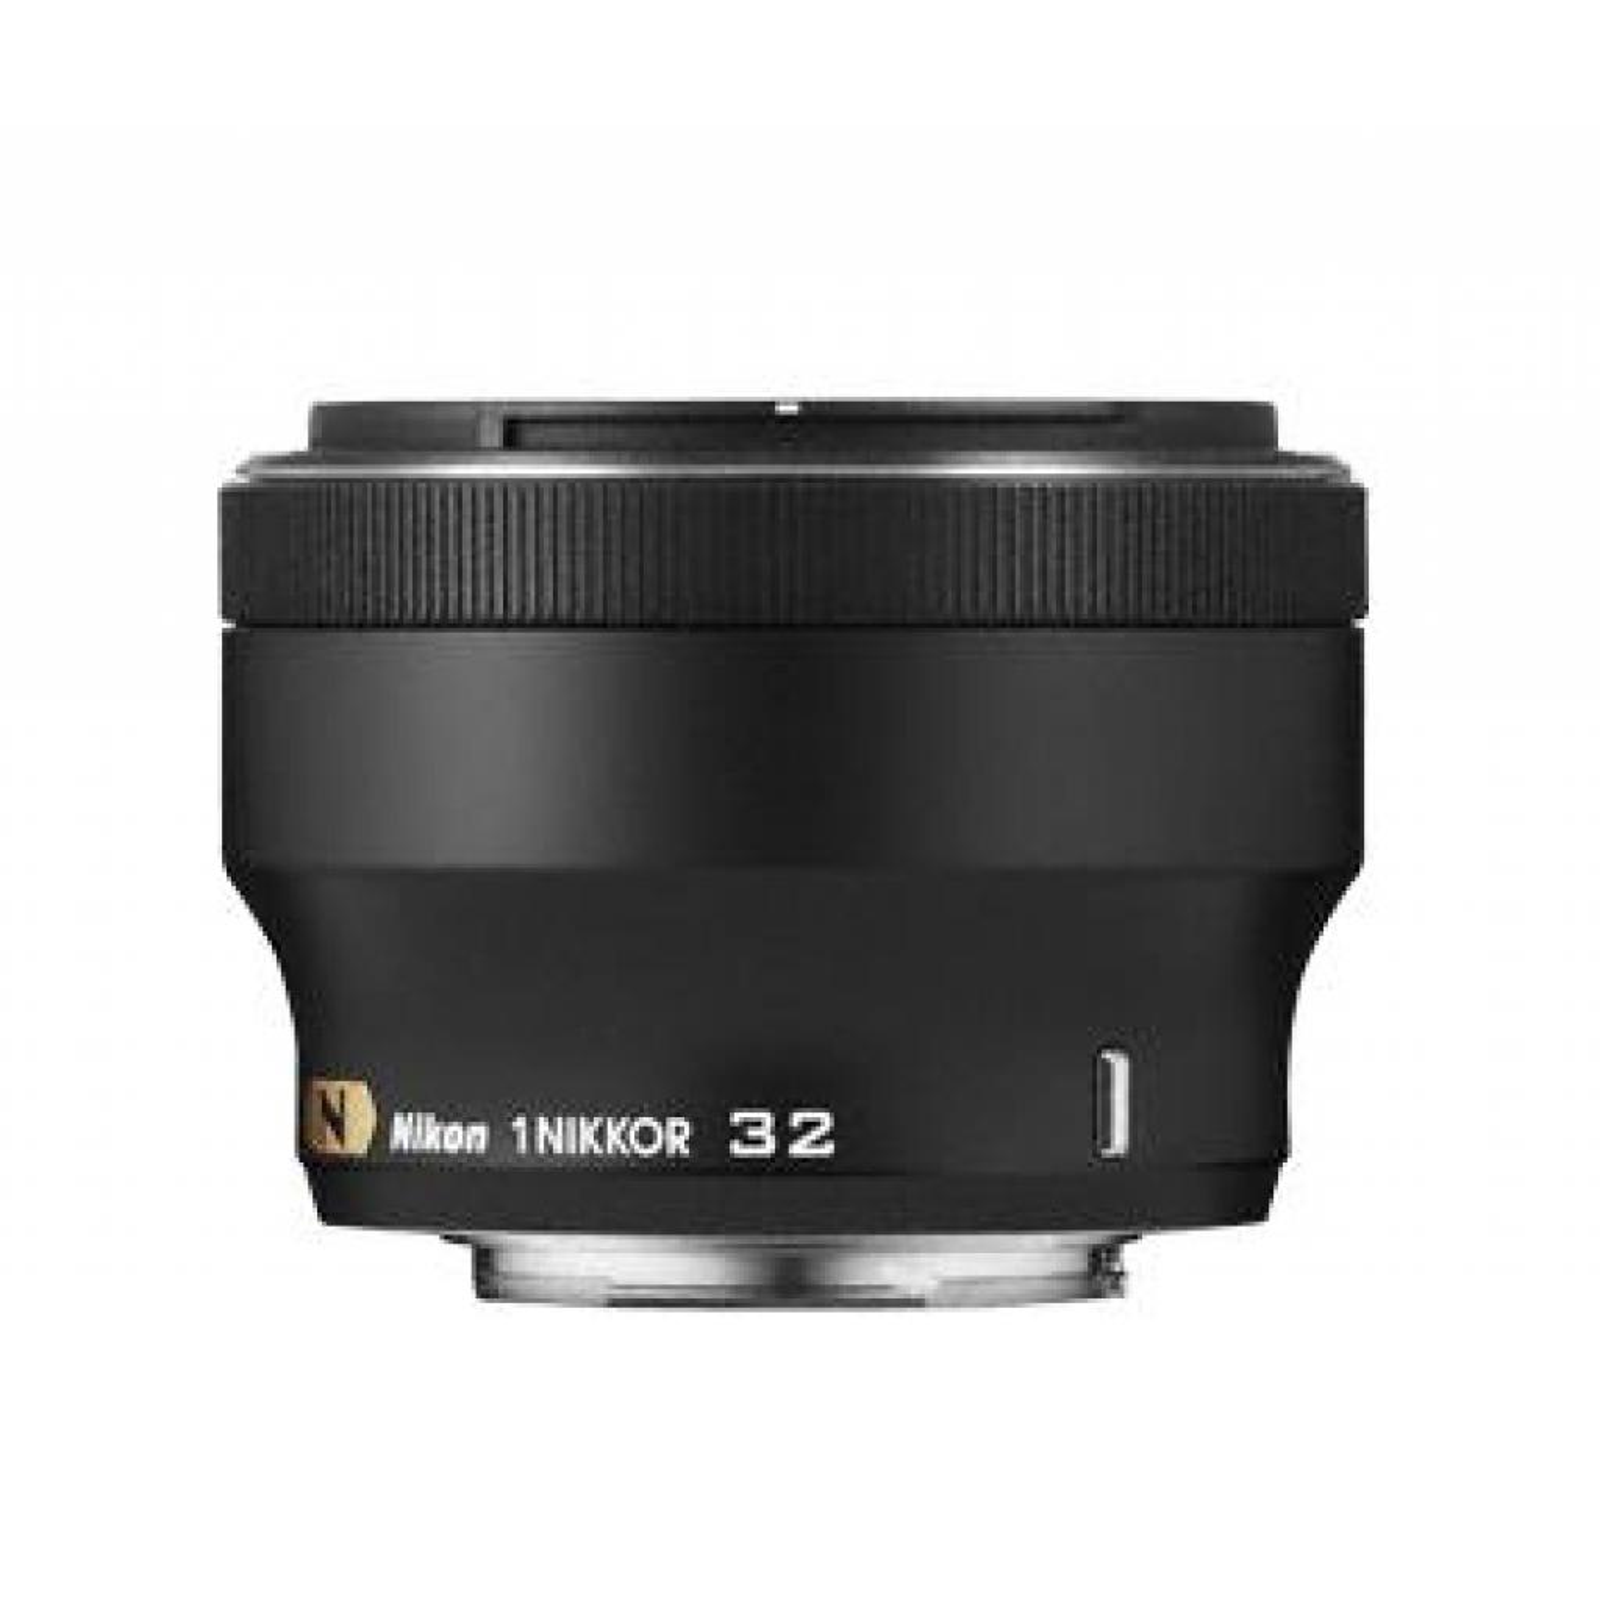 Объектив Nikon 1 Nikkor 32mm f/1.2 black (JVA301DA)